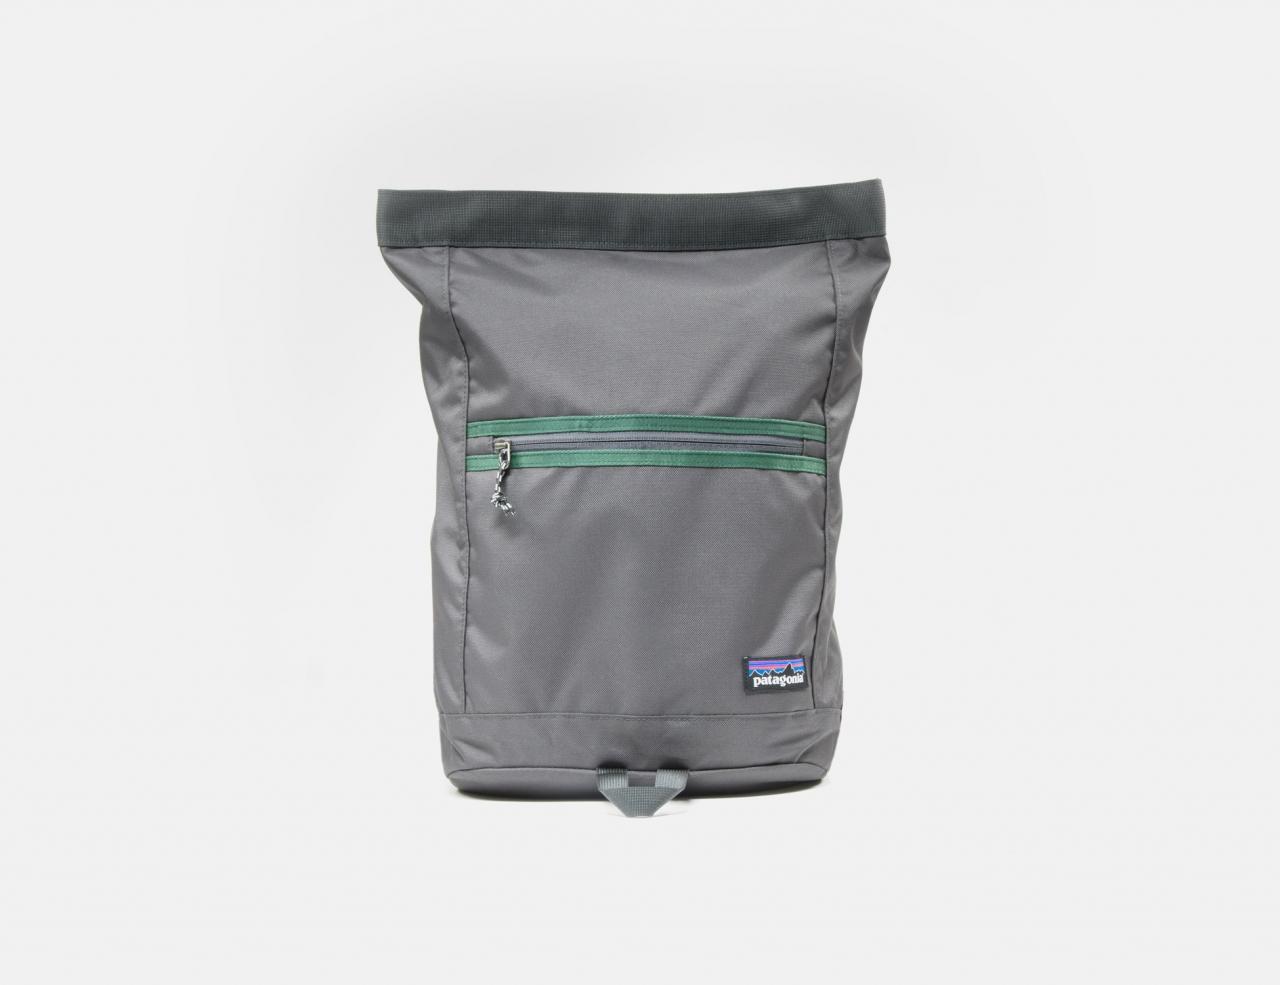 Patagonia Arbor Market Pack 15l - Forge Grey